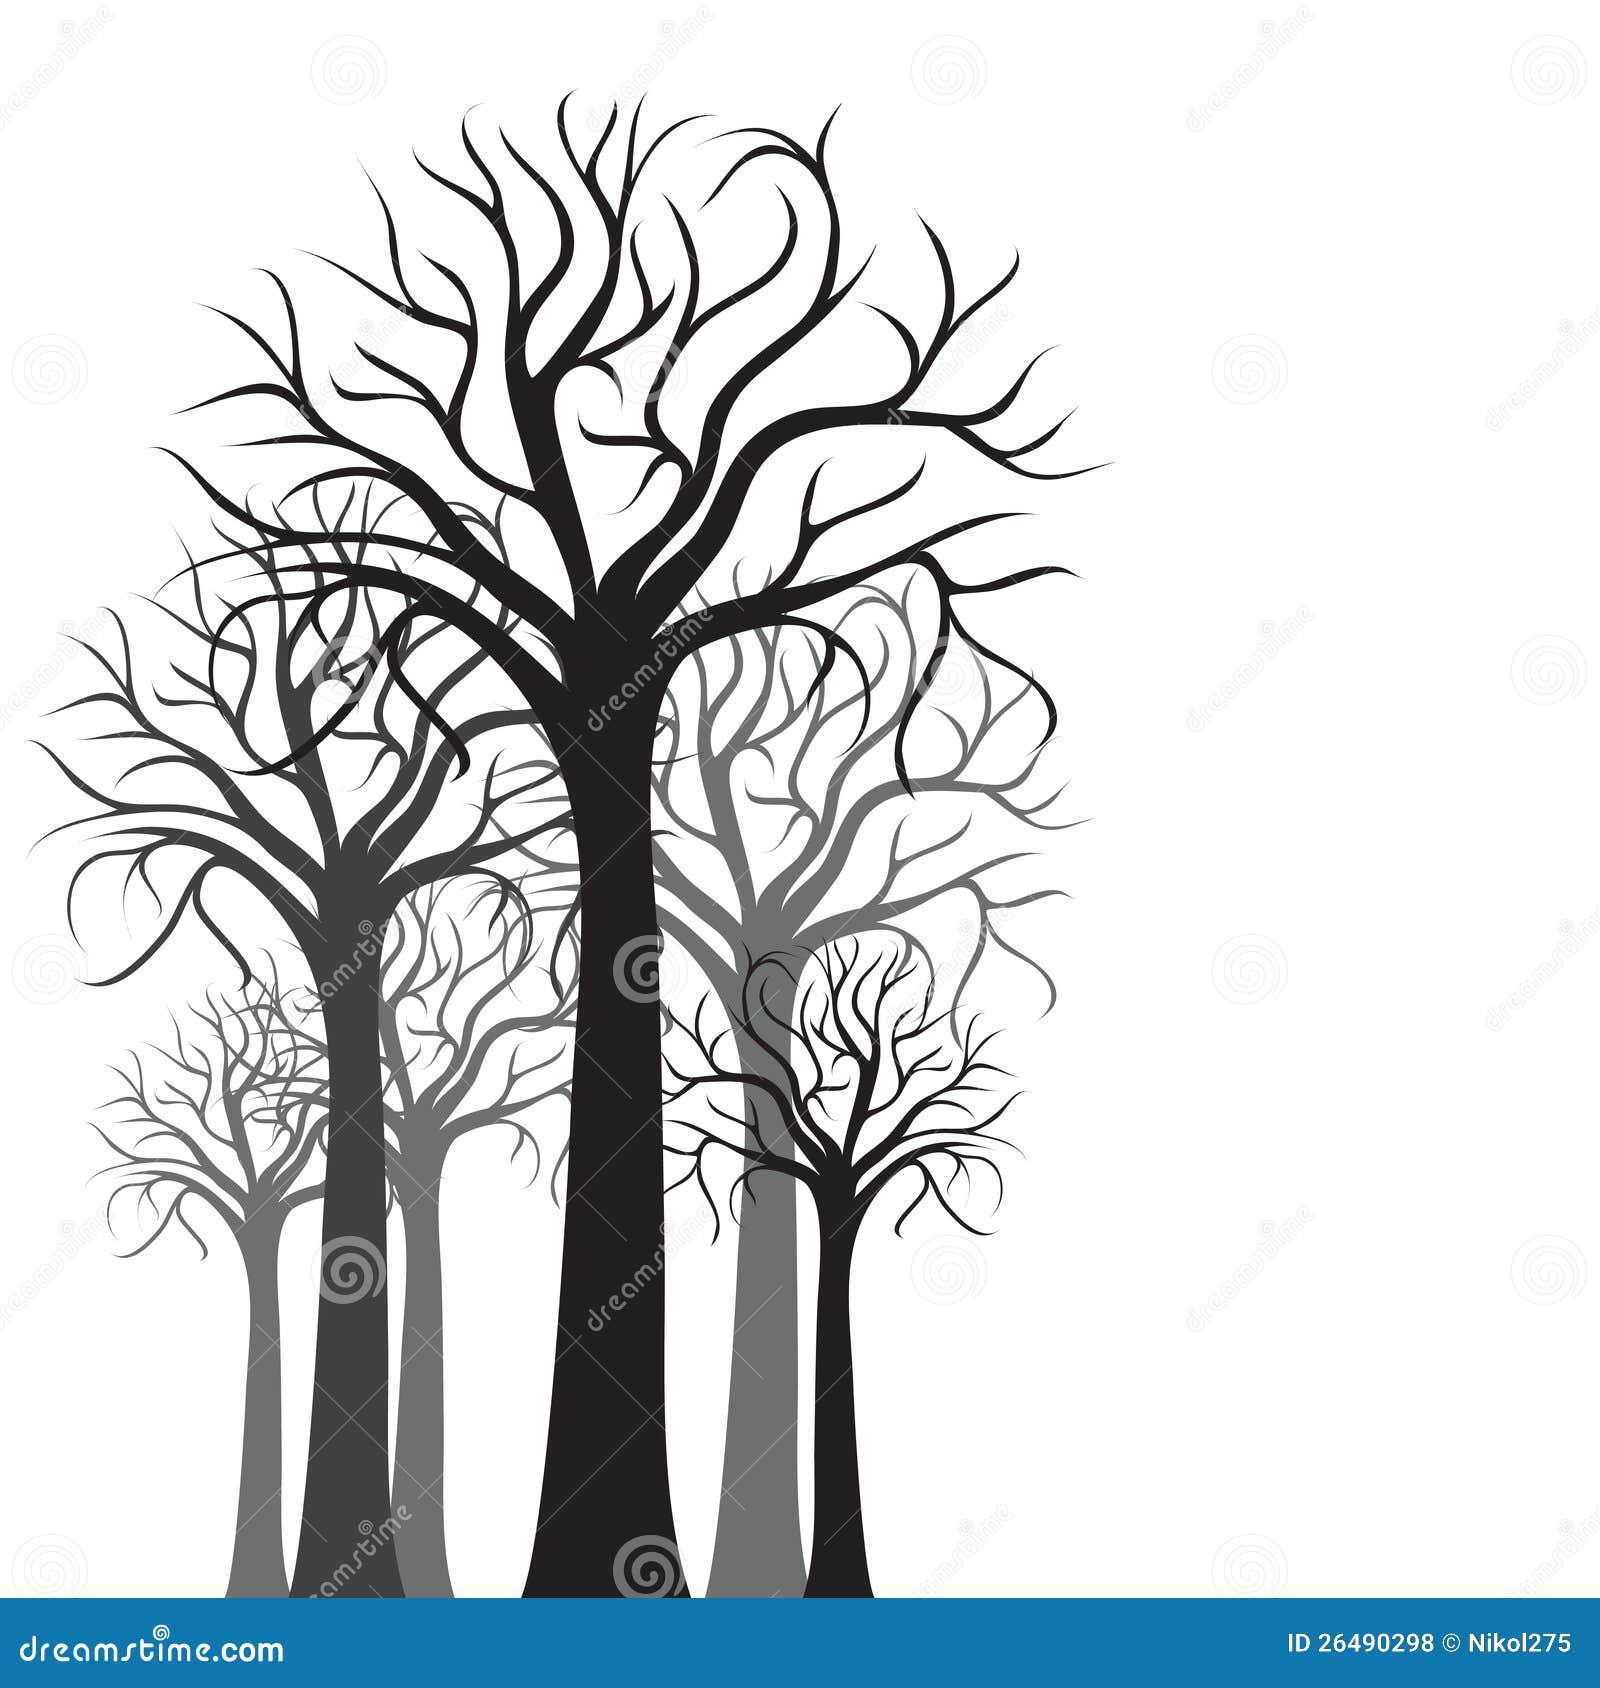 Schattenbilder der Bäume